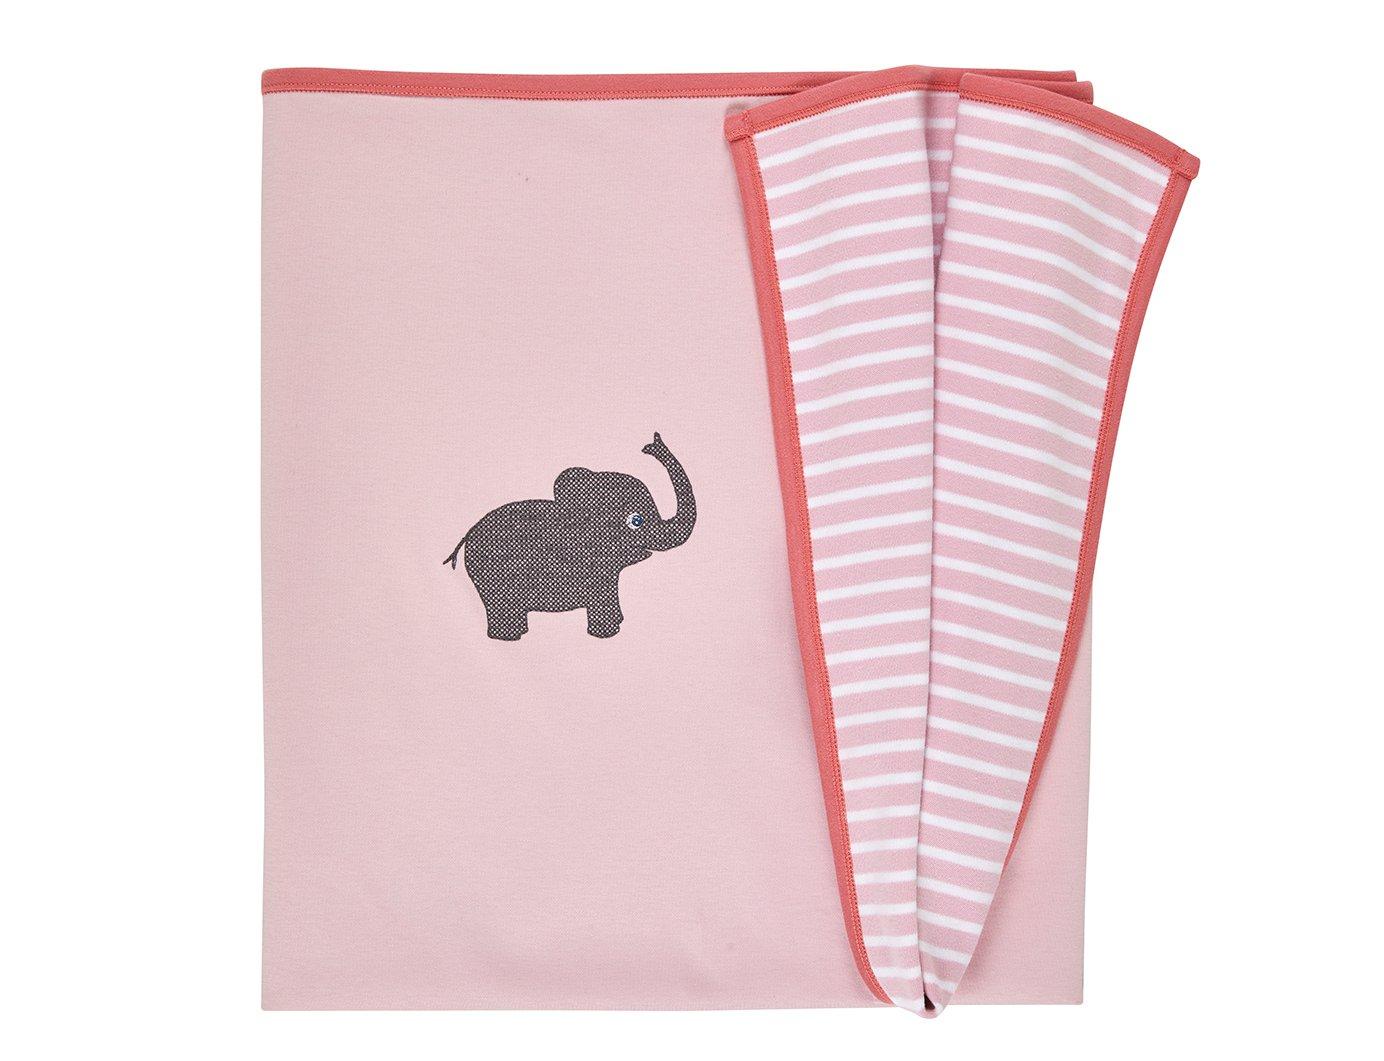 Image of Decken mit Elefant rosa Art.807774